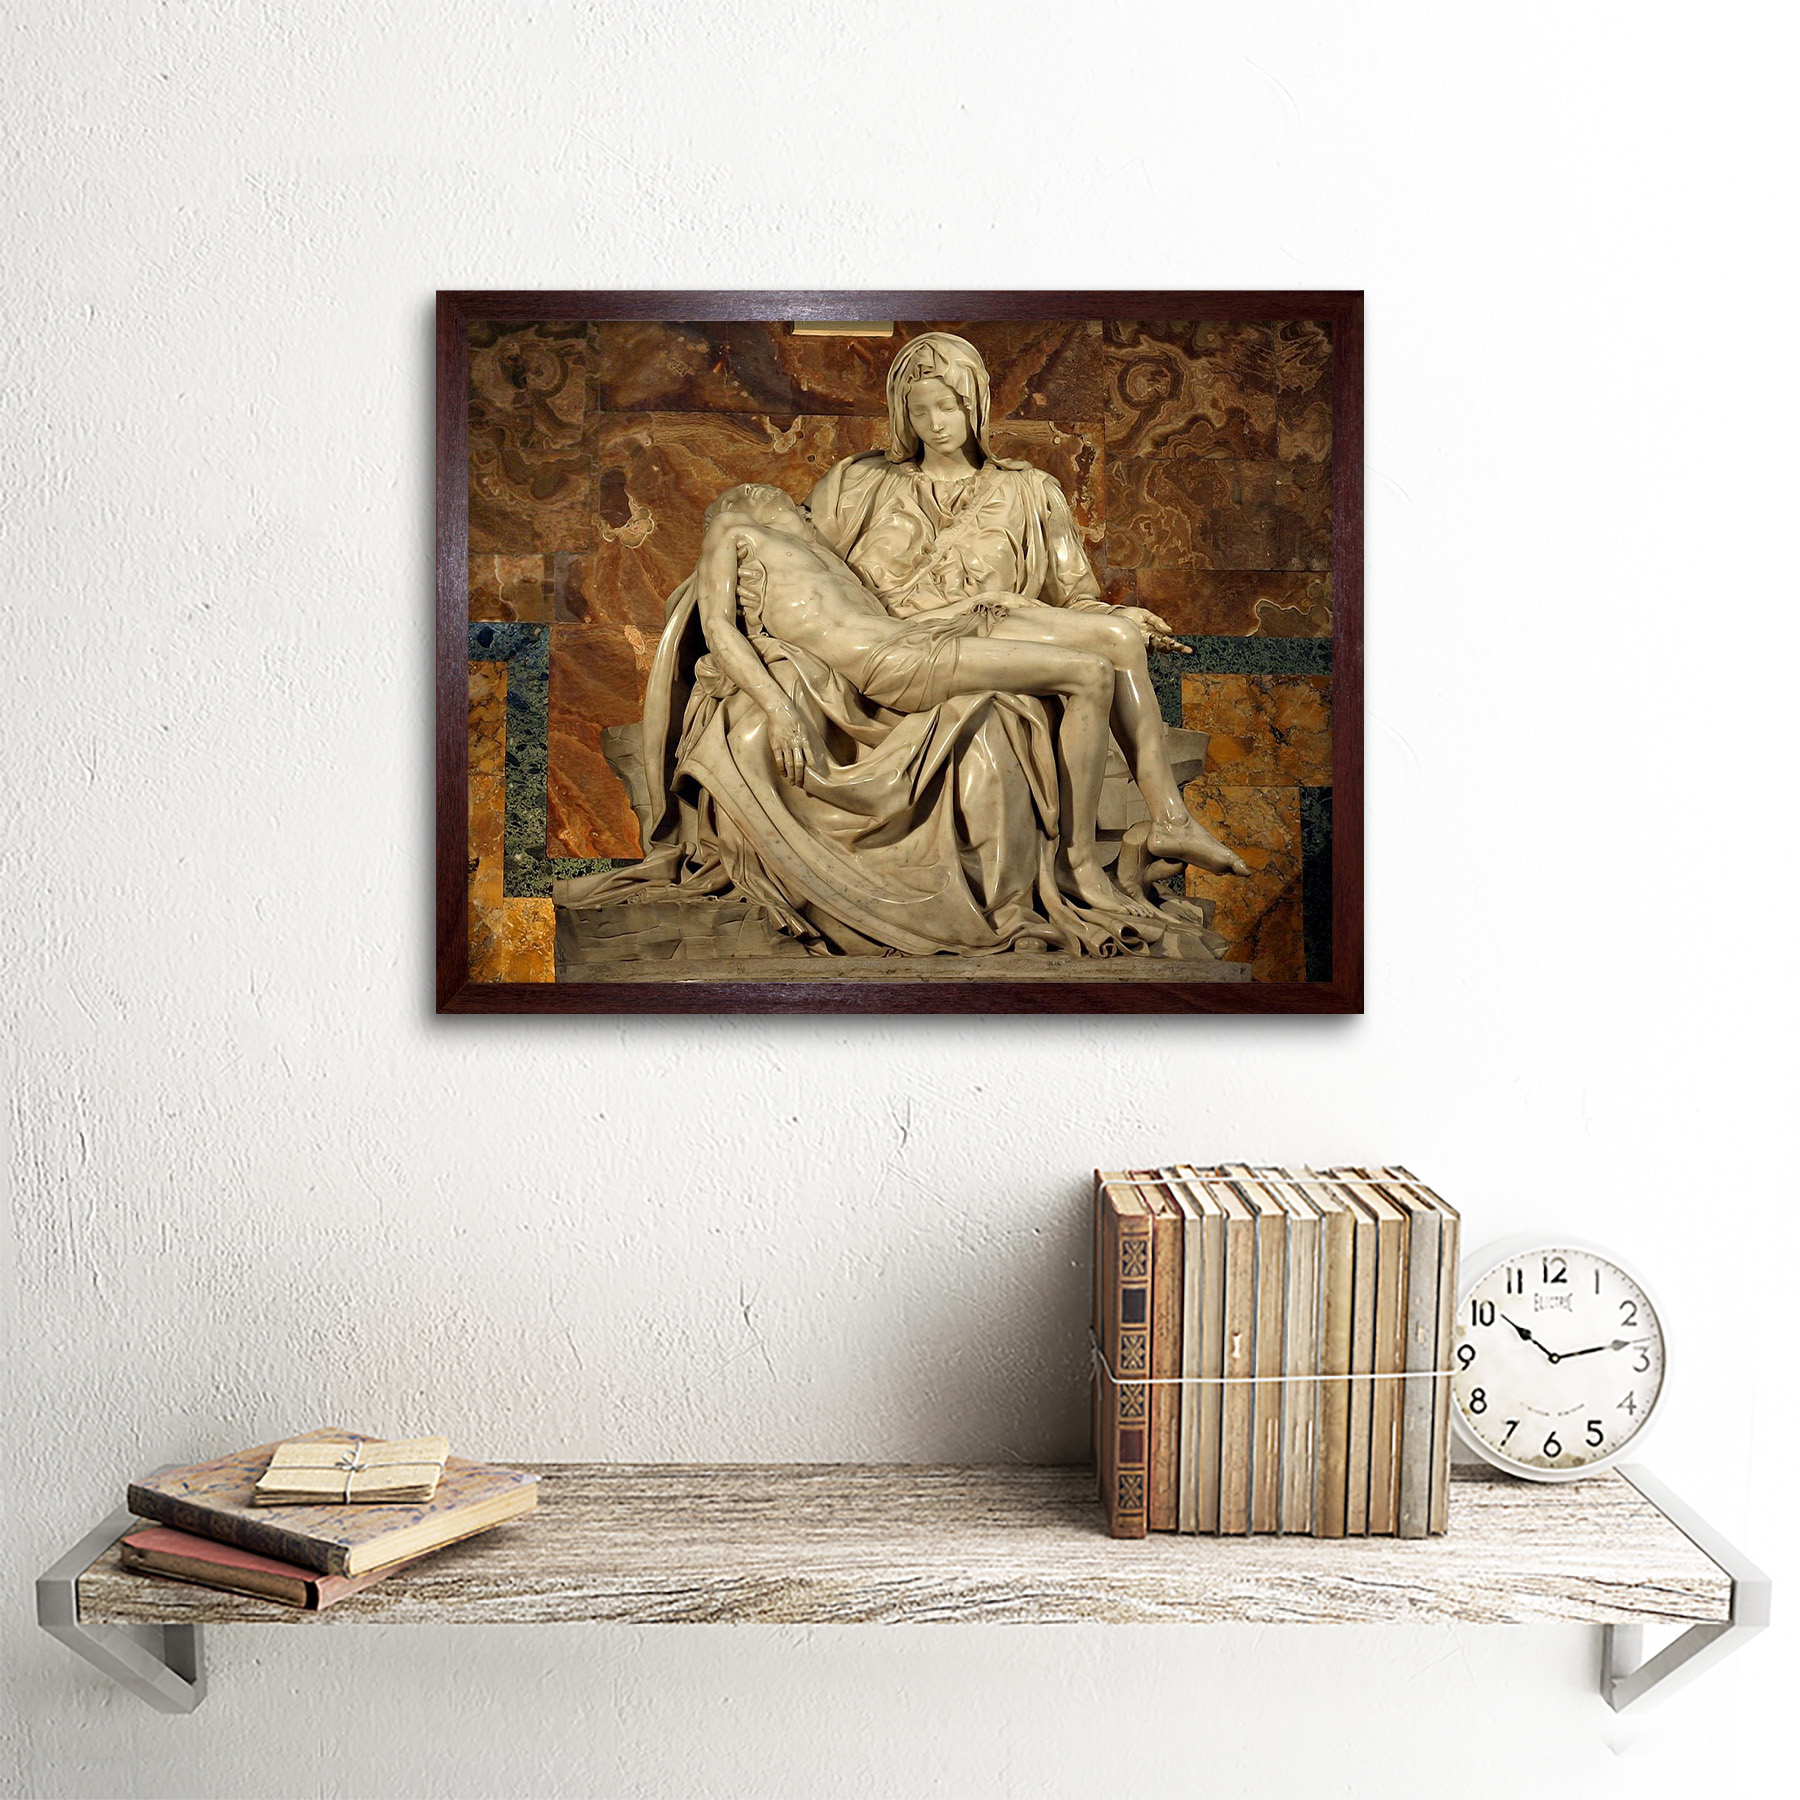 MICHELANGELO PIETA 1499 OLD MASTER PAINTING PRINT POSTER 1987OMLV